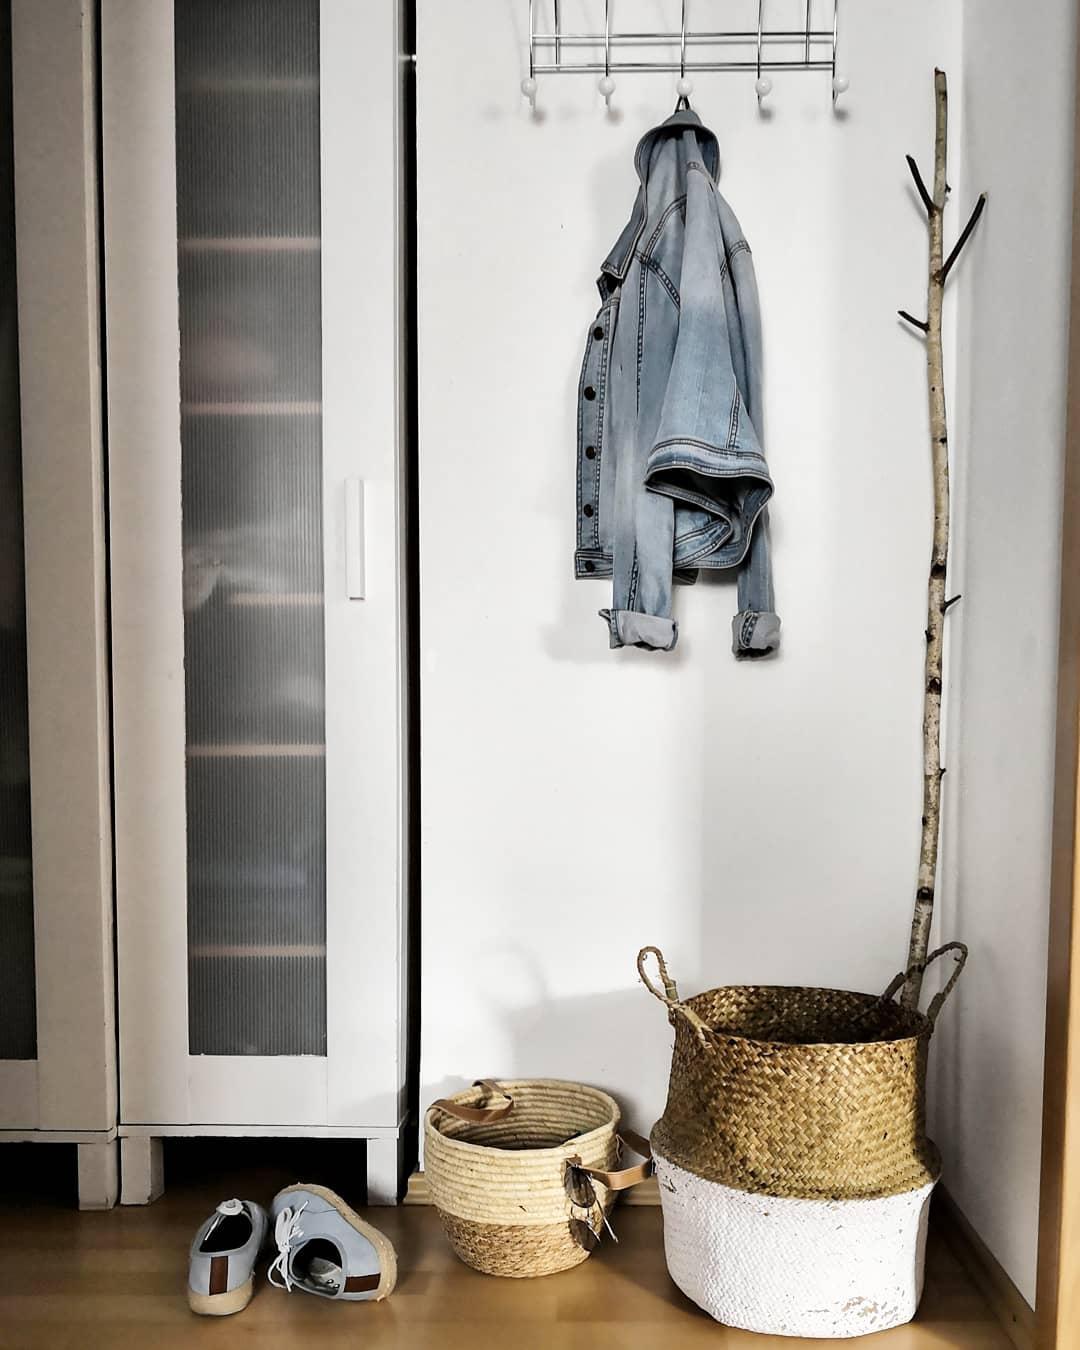 Garderoben-Ideen: So schaffst du stilvoll Ordnung!